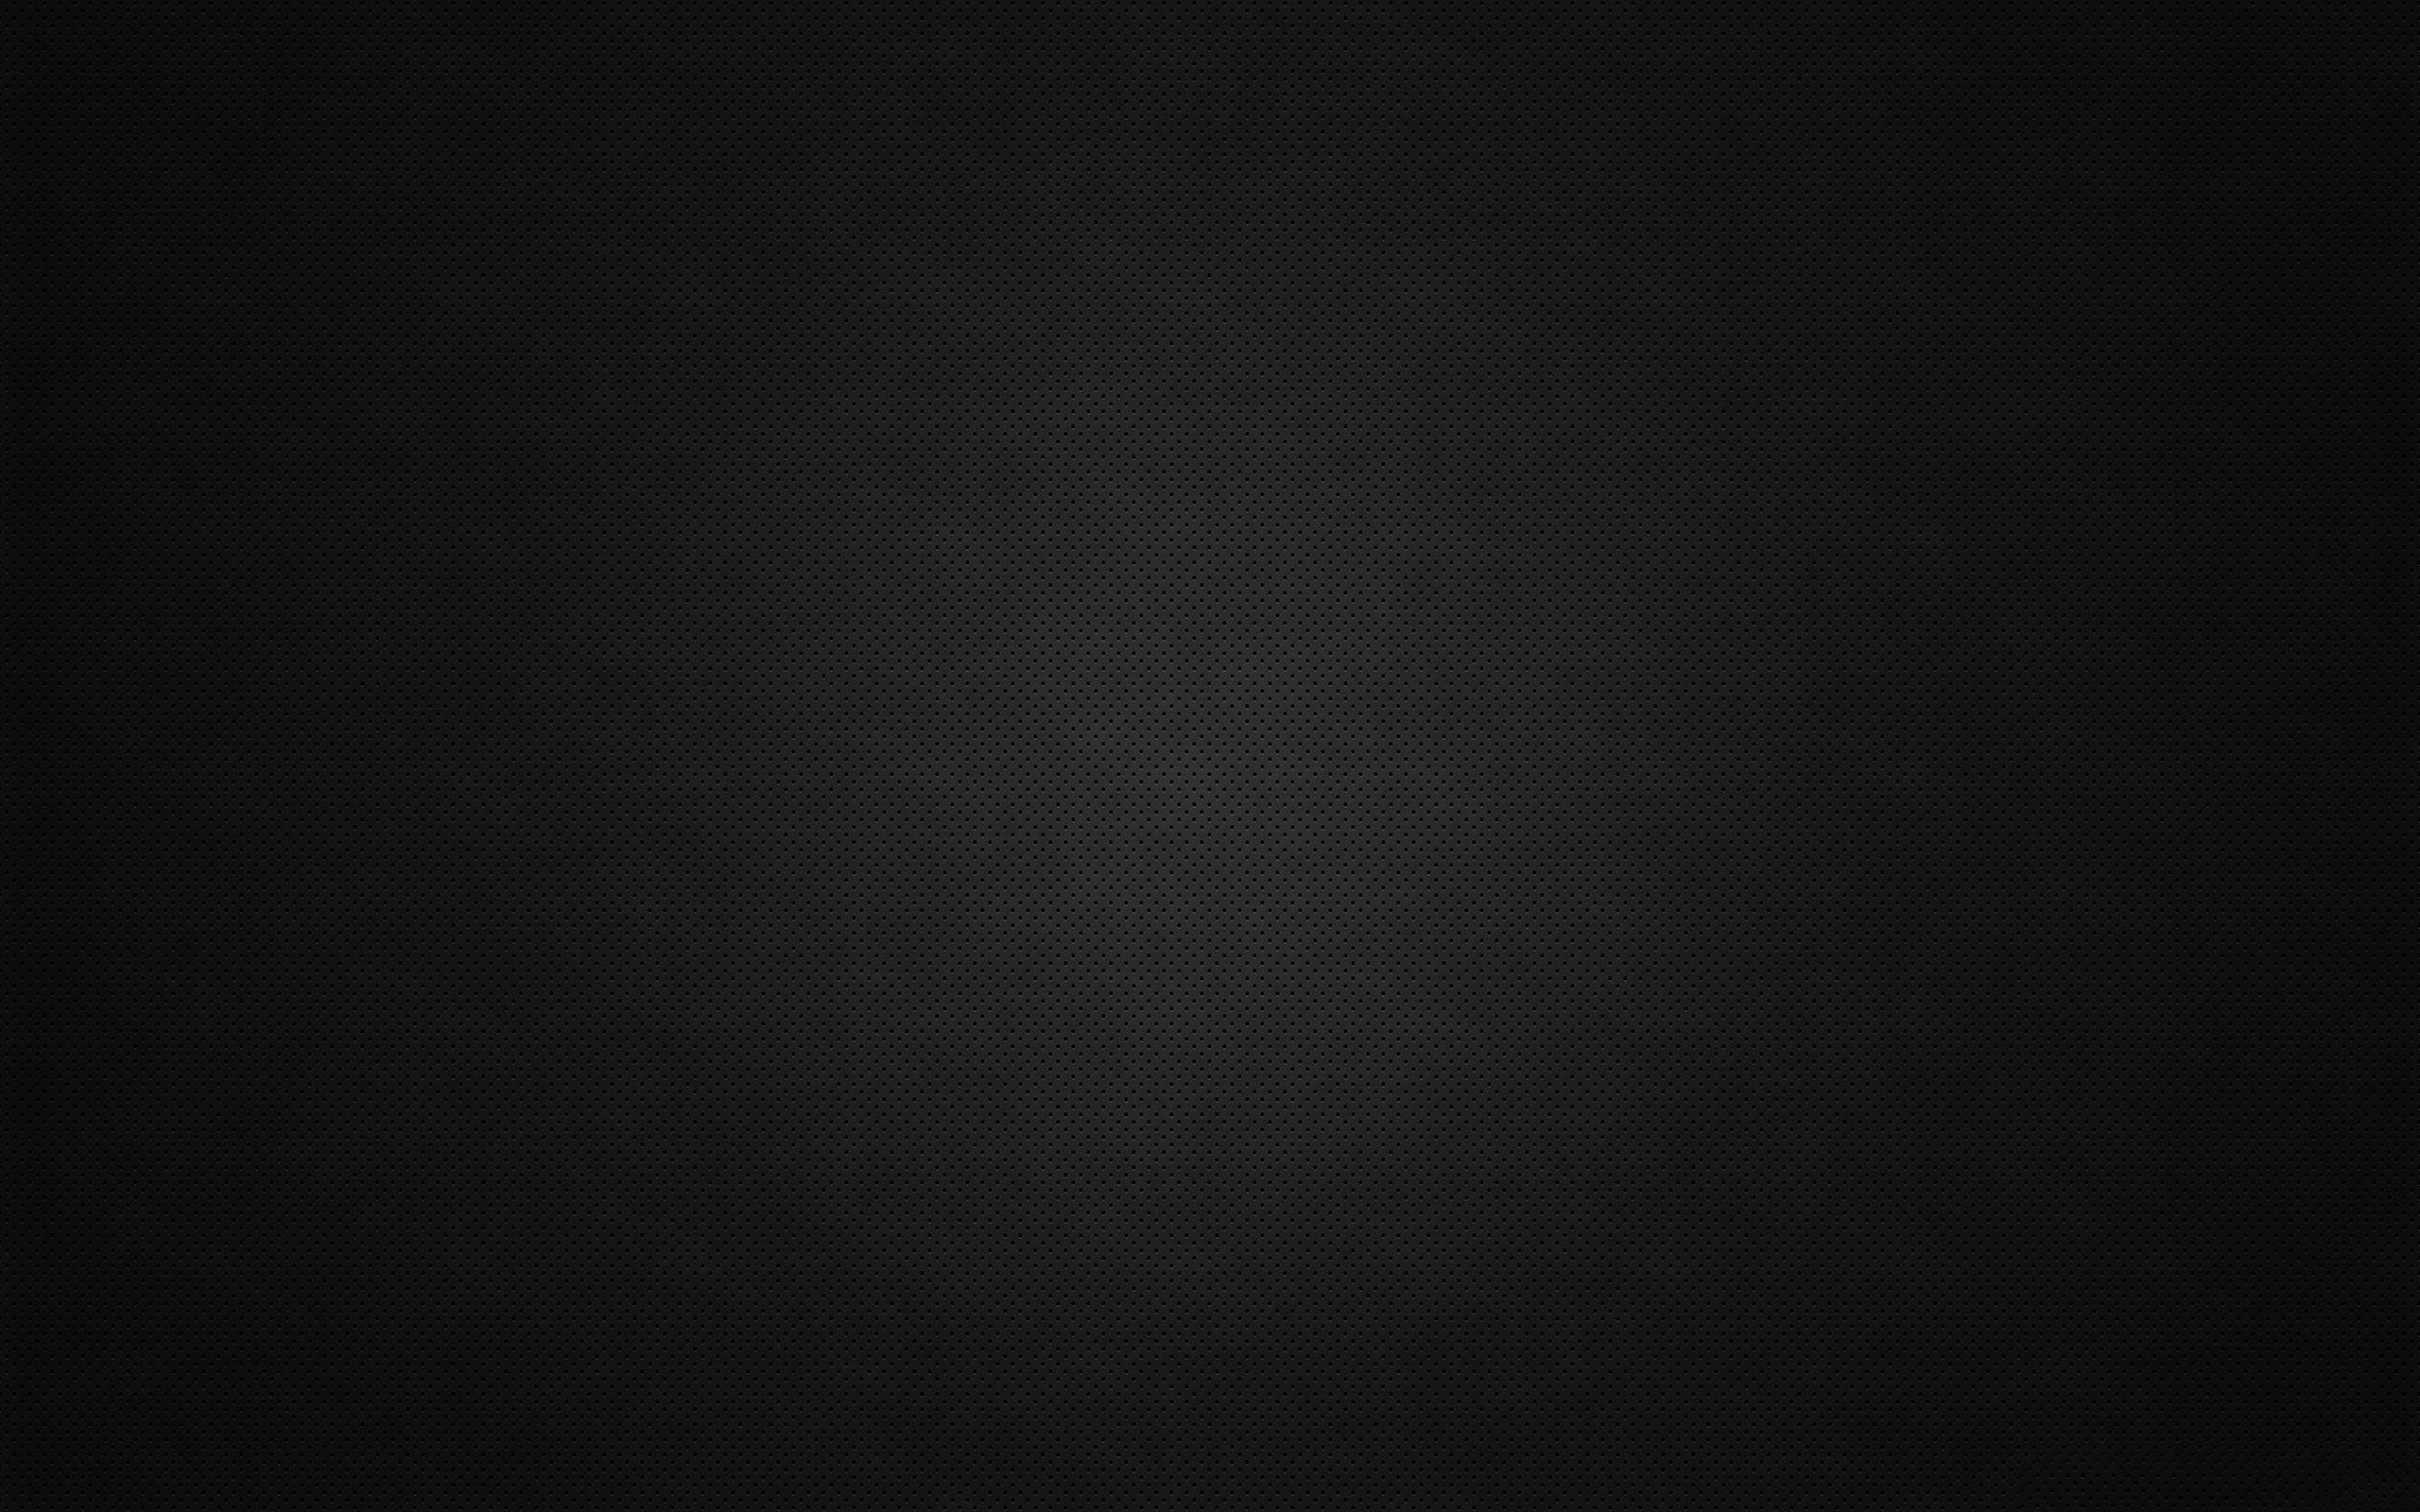 Black Background WallpapersCharlie 2560x1600